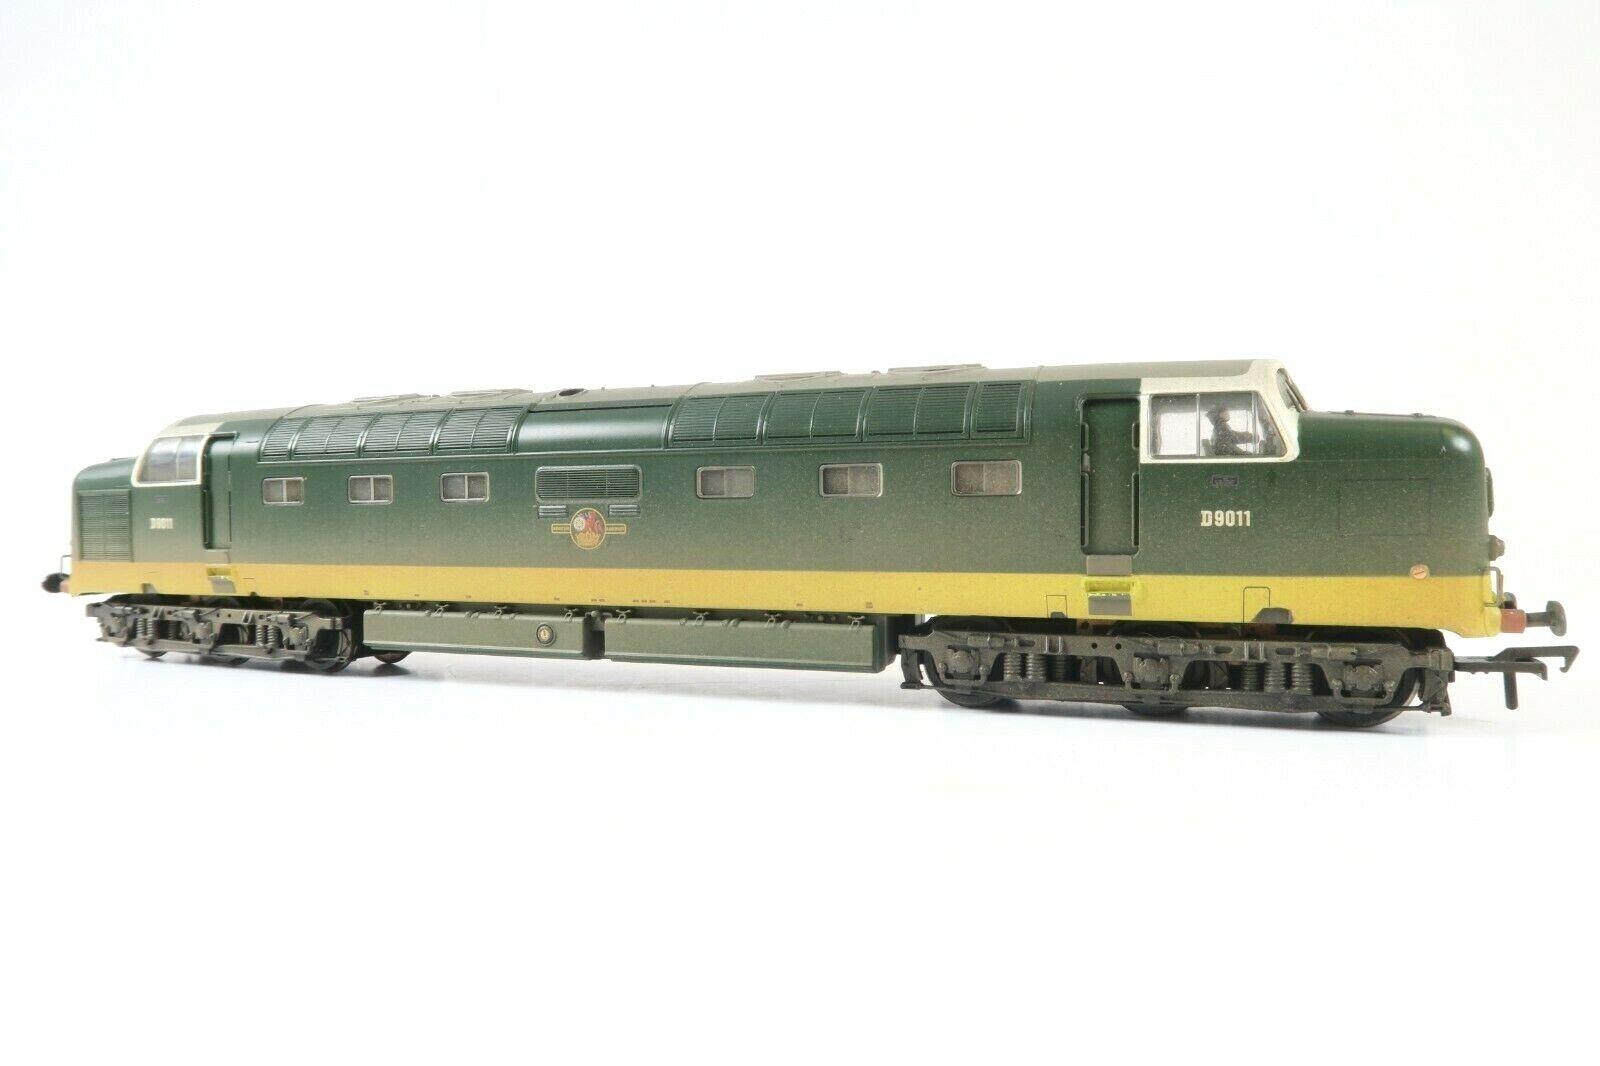 BACHuomoN OO GAUGE 32529B classe 55 DIESEL D9011 BR TWO TONE verde WEATHErosso